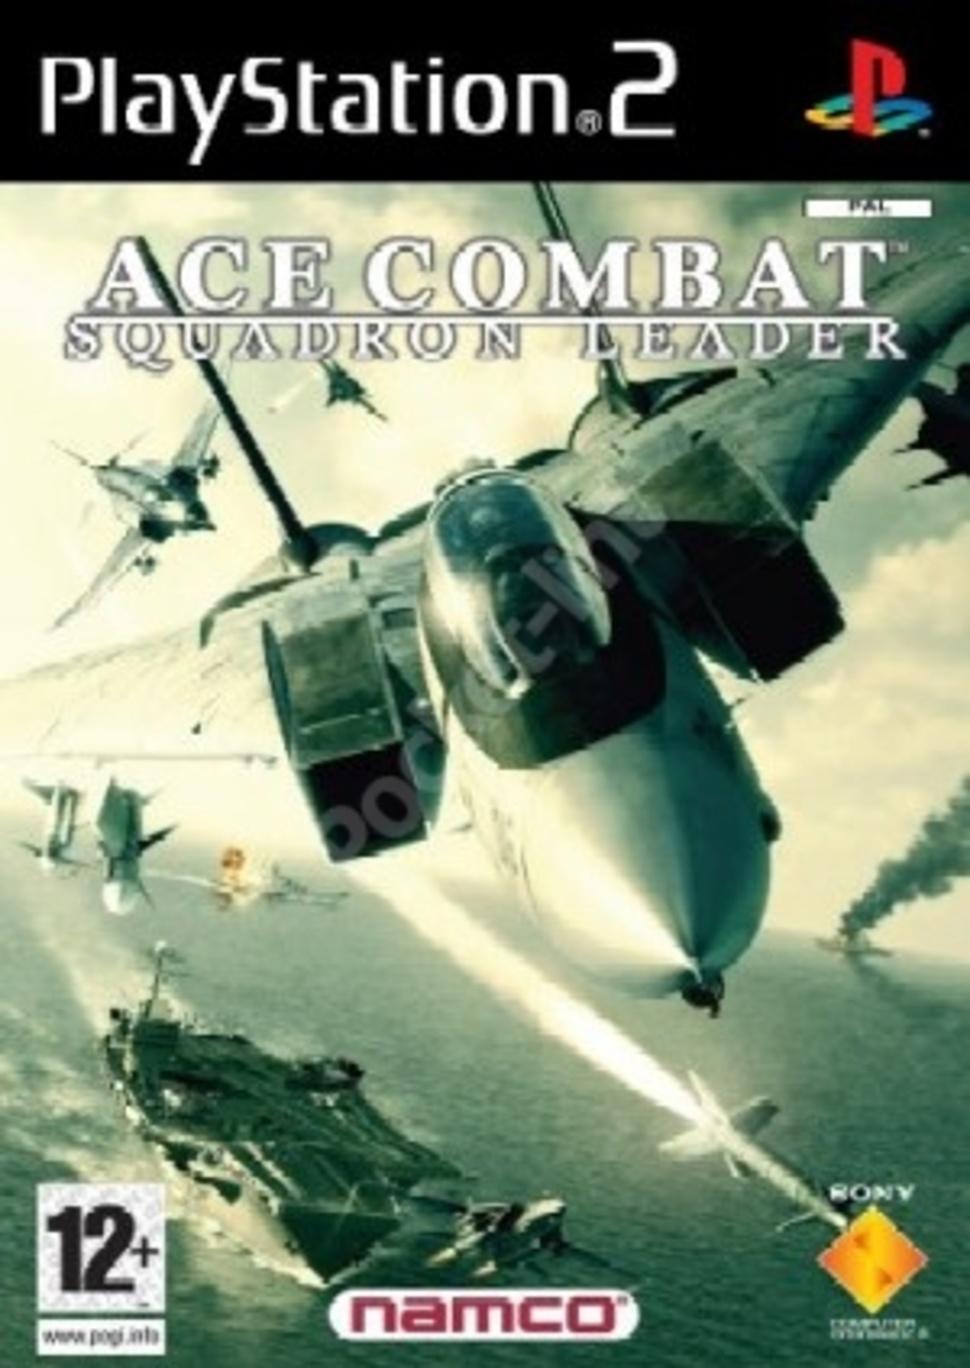 Ace Combat Squadron Leader